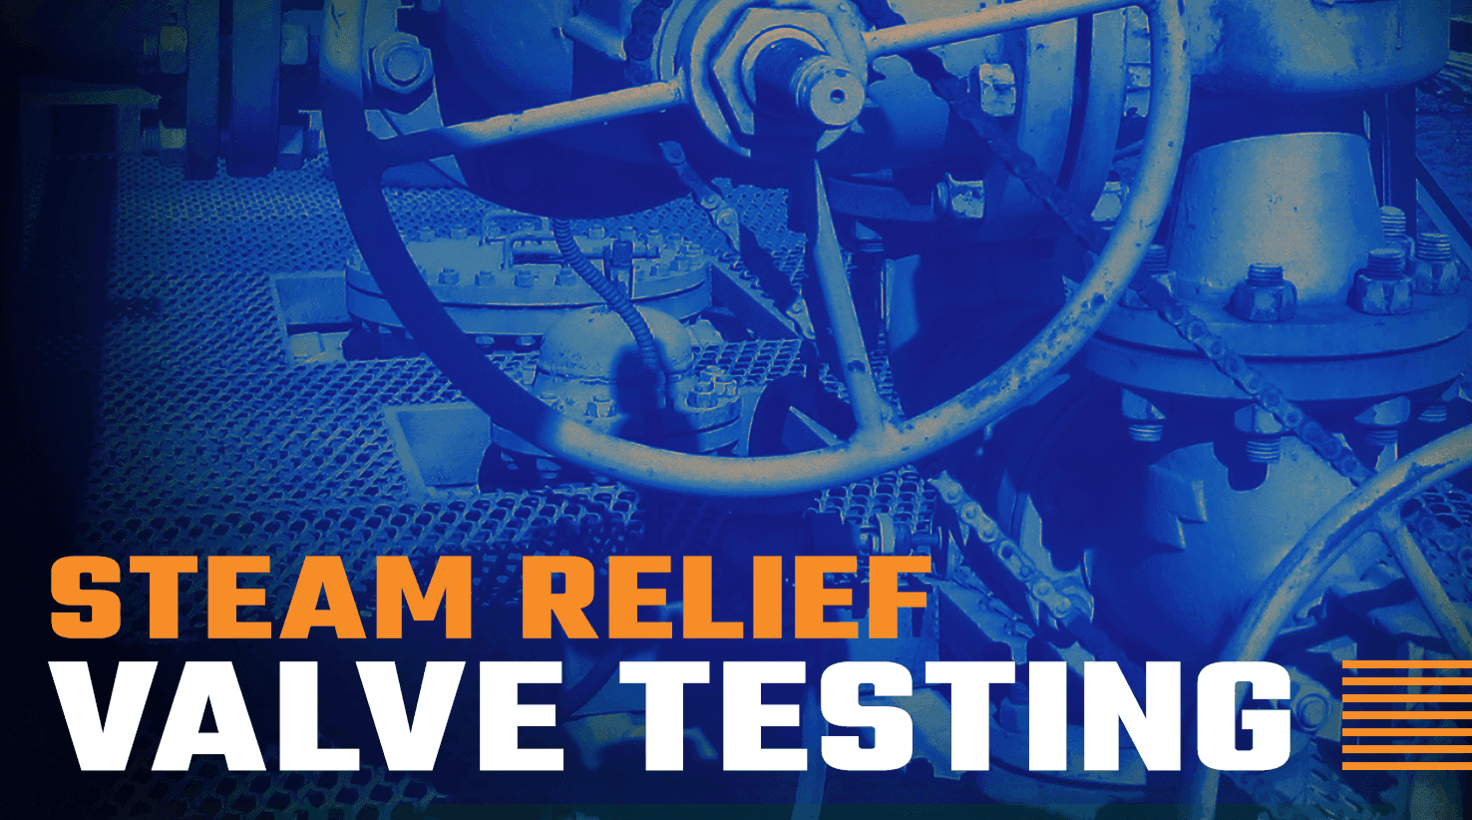 Steam Relief Valve Testing